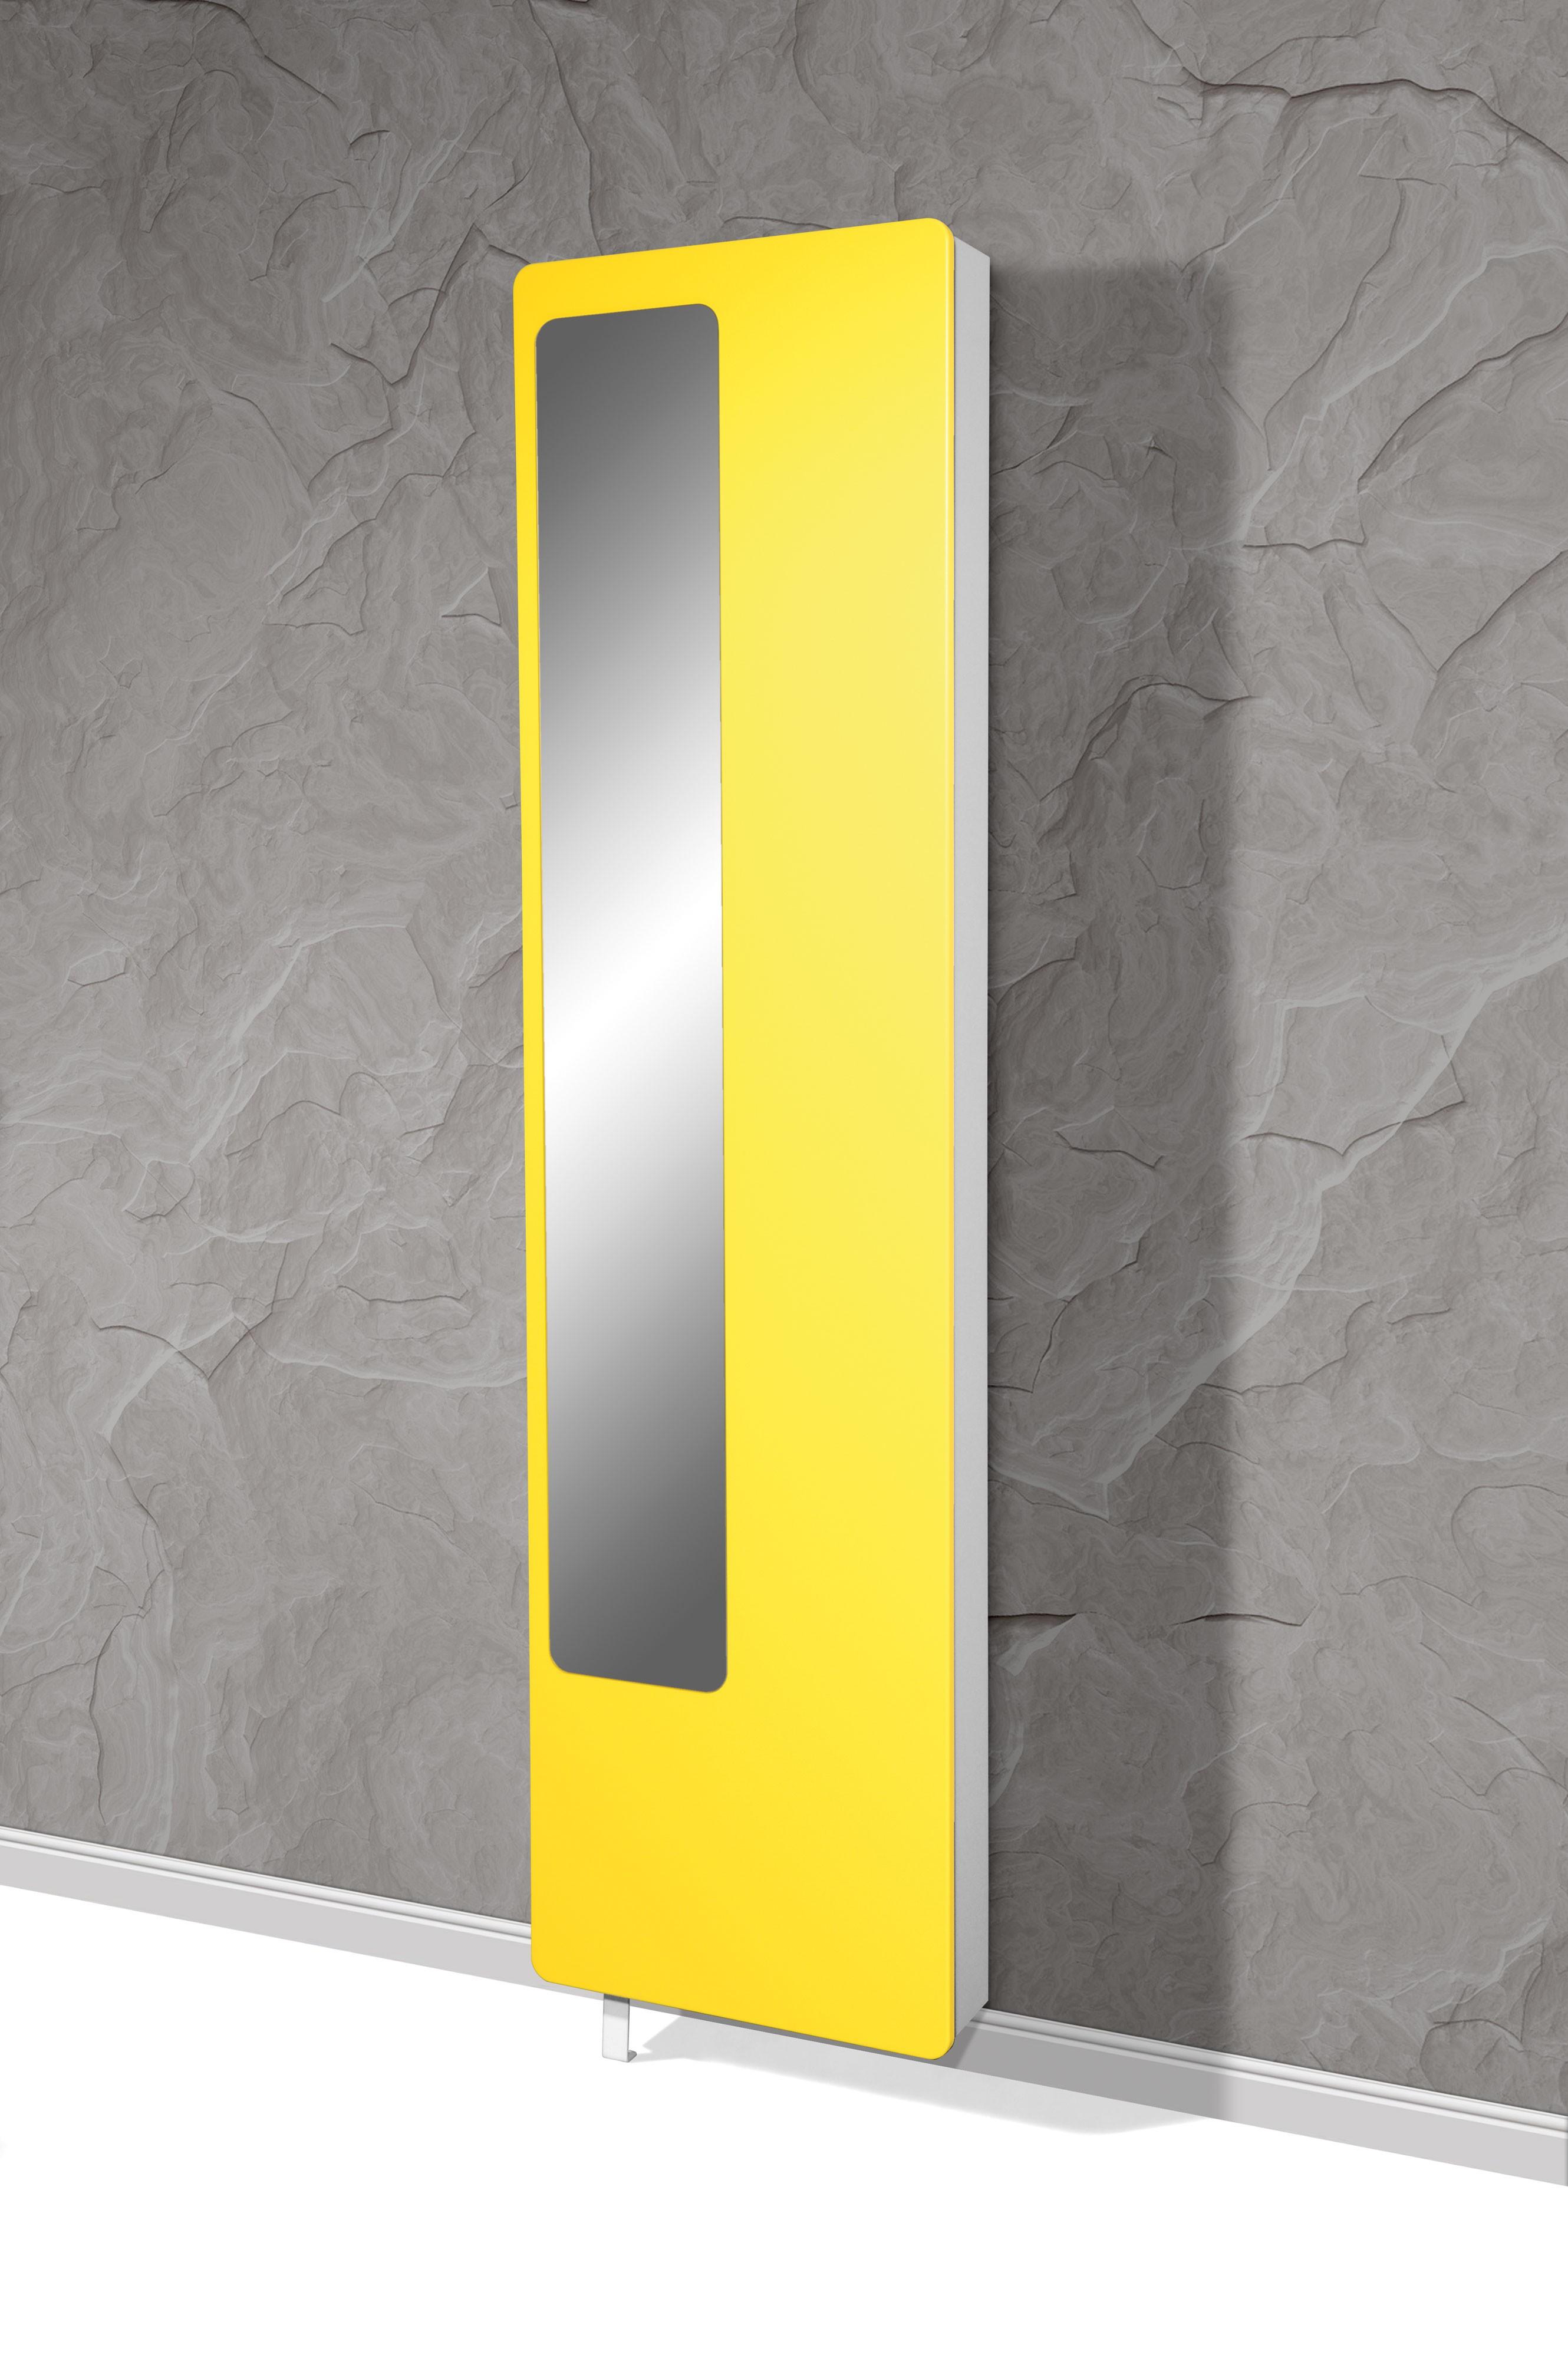 drehbarer schuhschrank mehrzweckschrank mod gm714 weiss gelb h c m bel. Black Bedroom Furniture Sets. Home Design Ideas